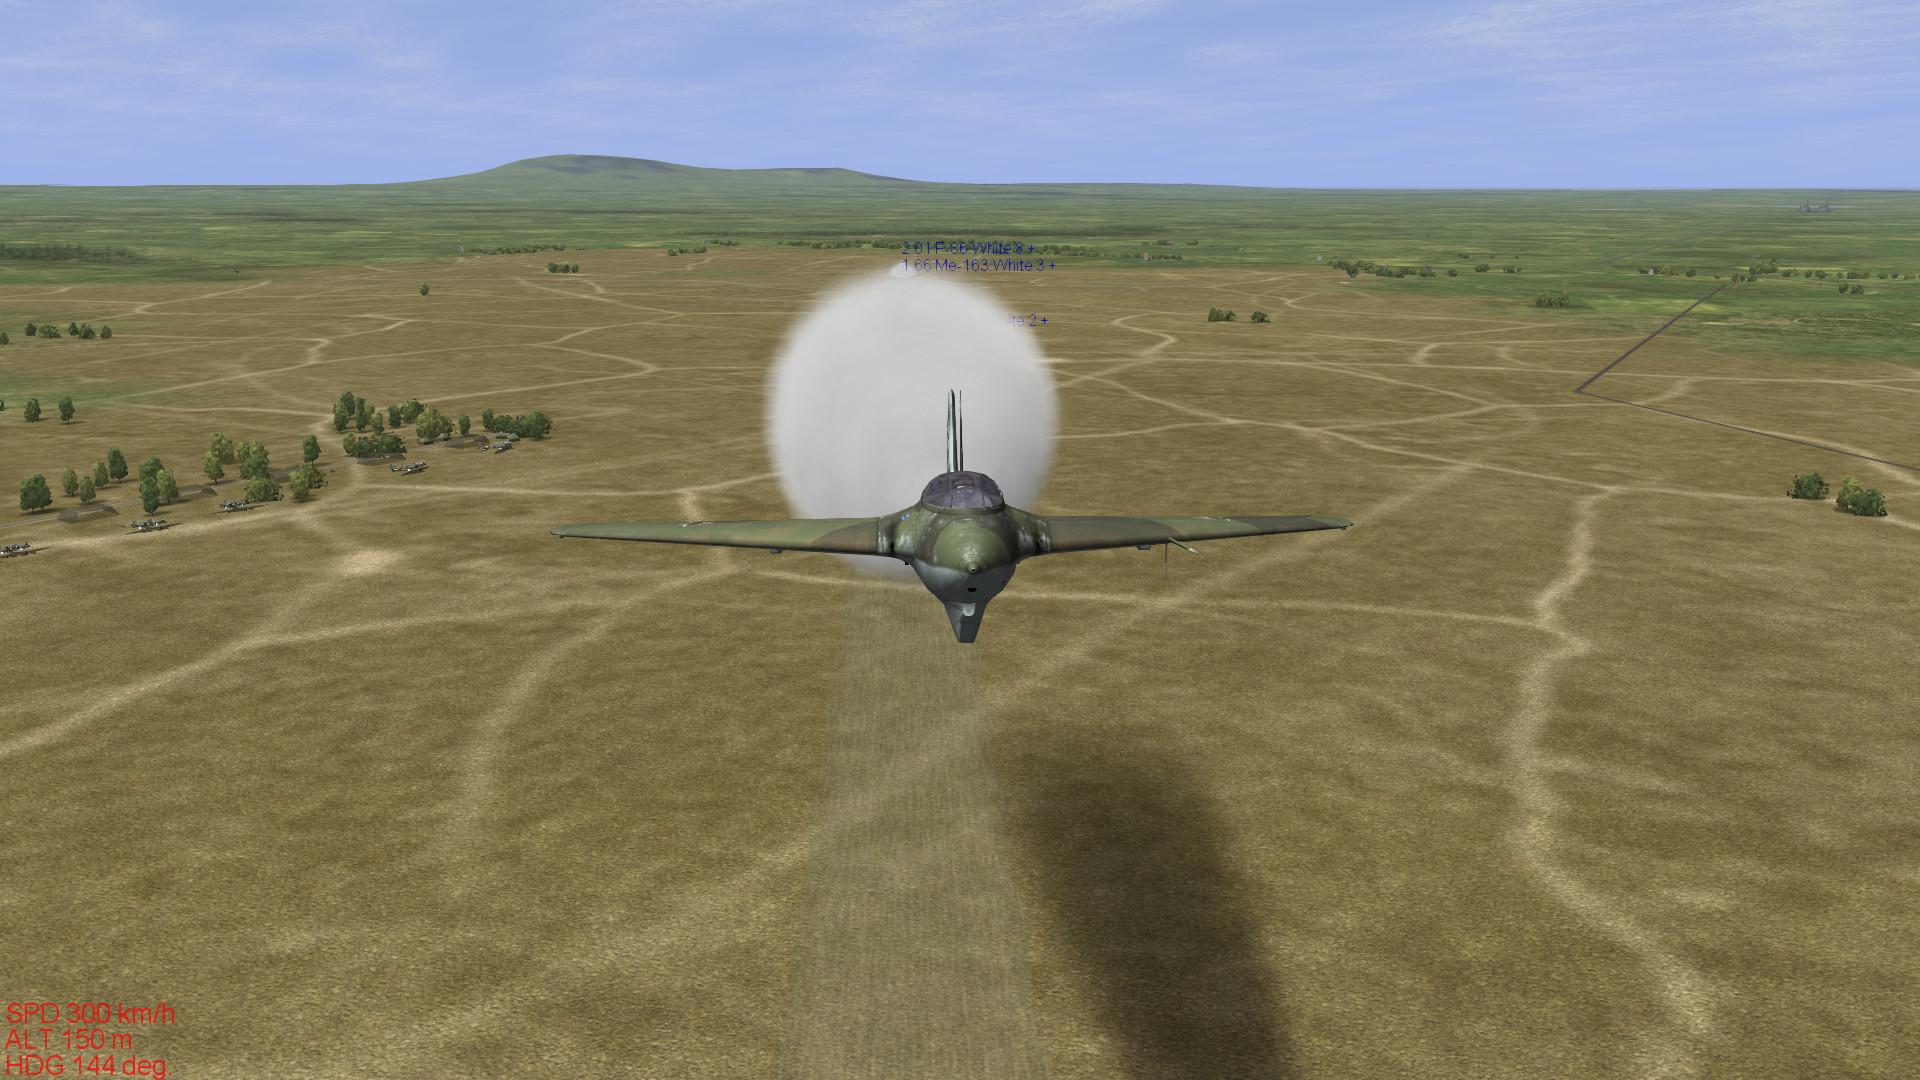 IL-2 Sturmovik: 1946 GAME PATCH v410 - Free download